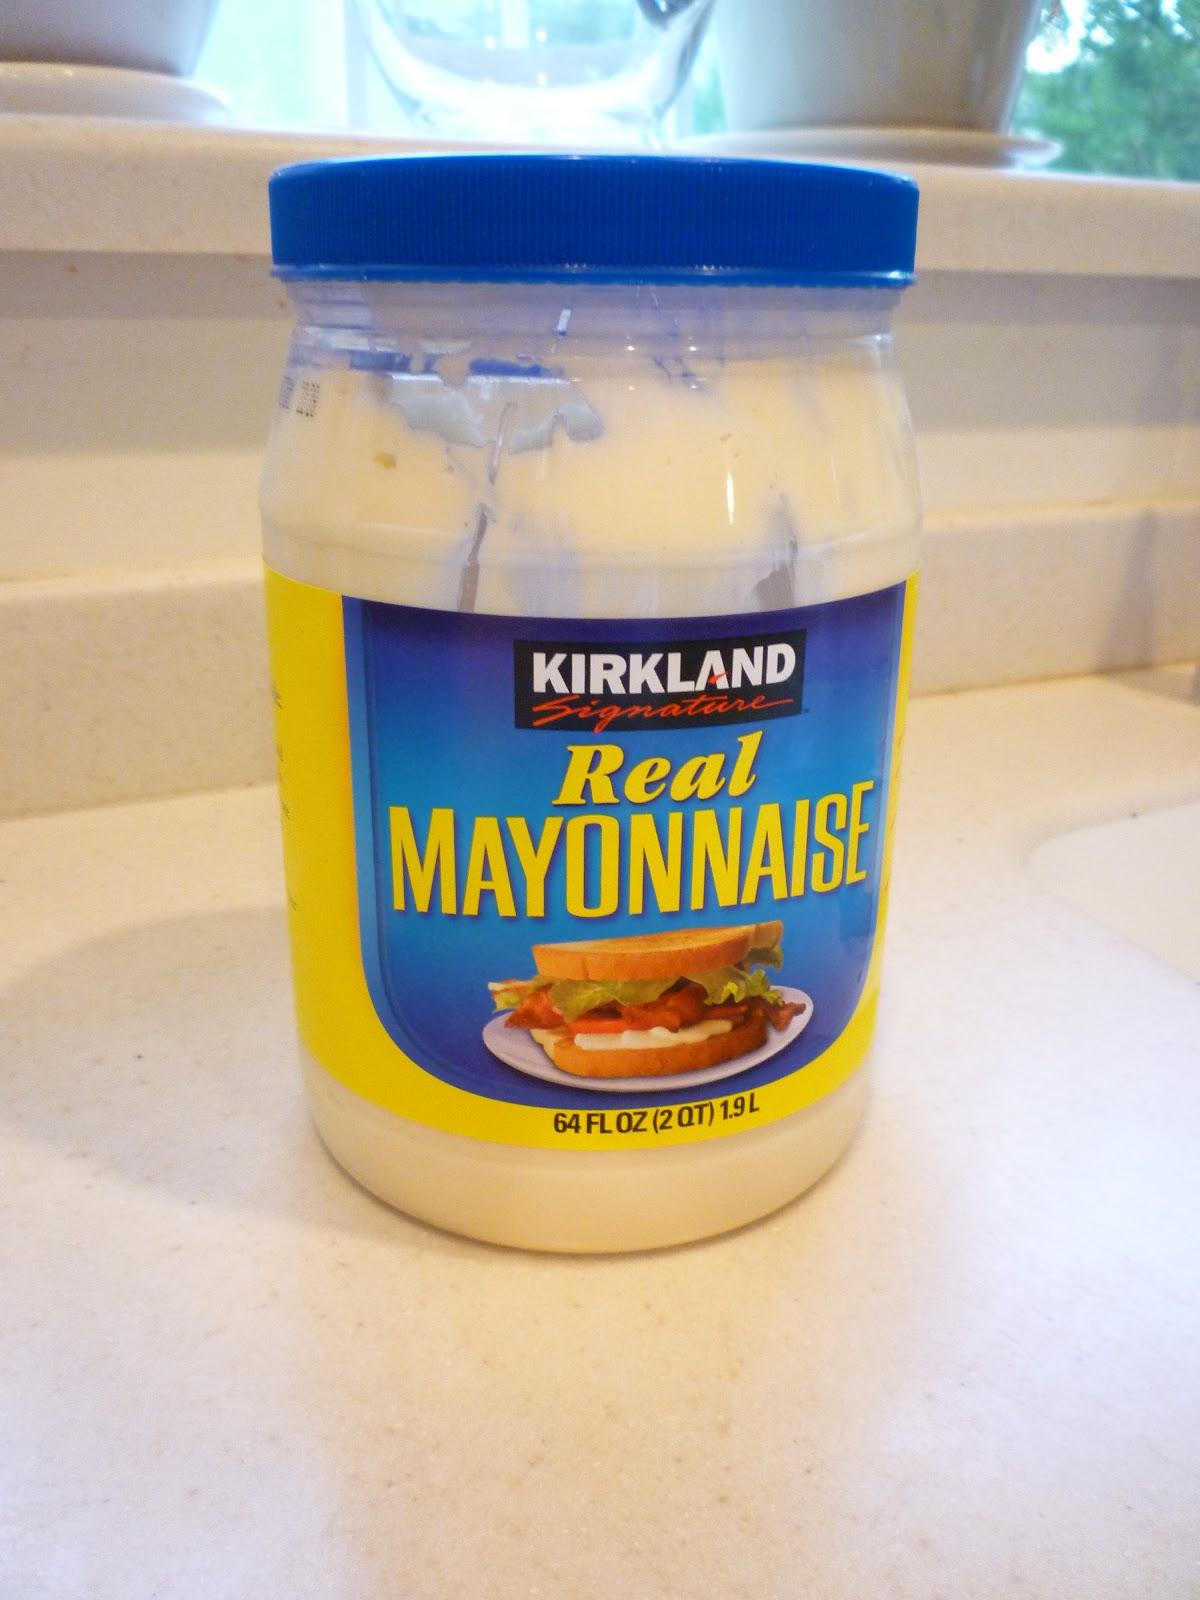 Amazing Meals: Kirkland Brand Mayonnaise